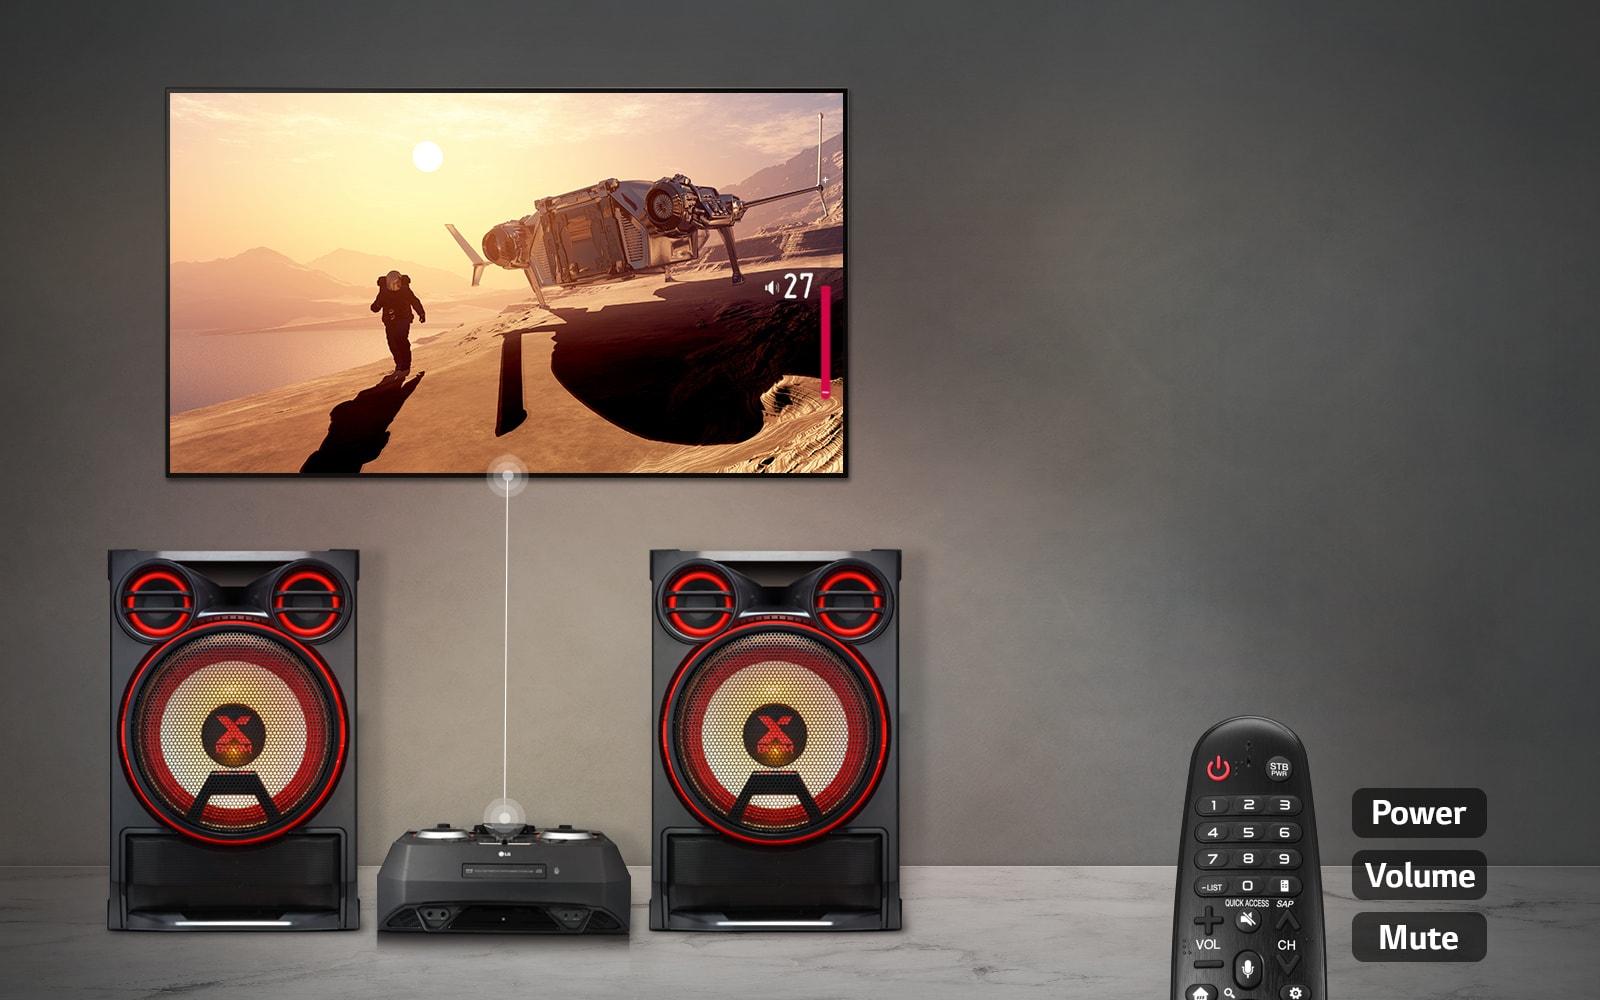 10_CK99_TV_Sound_Sync_Desktop